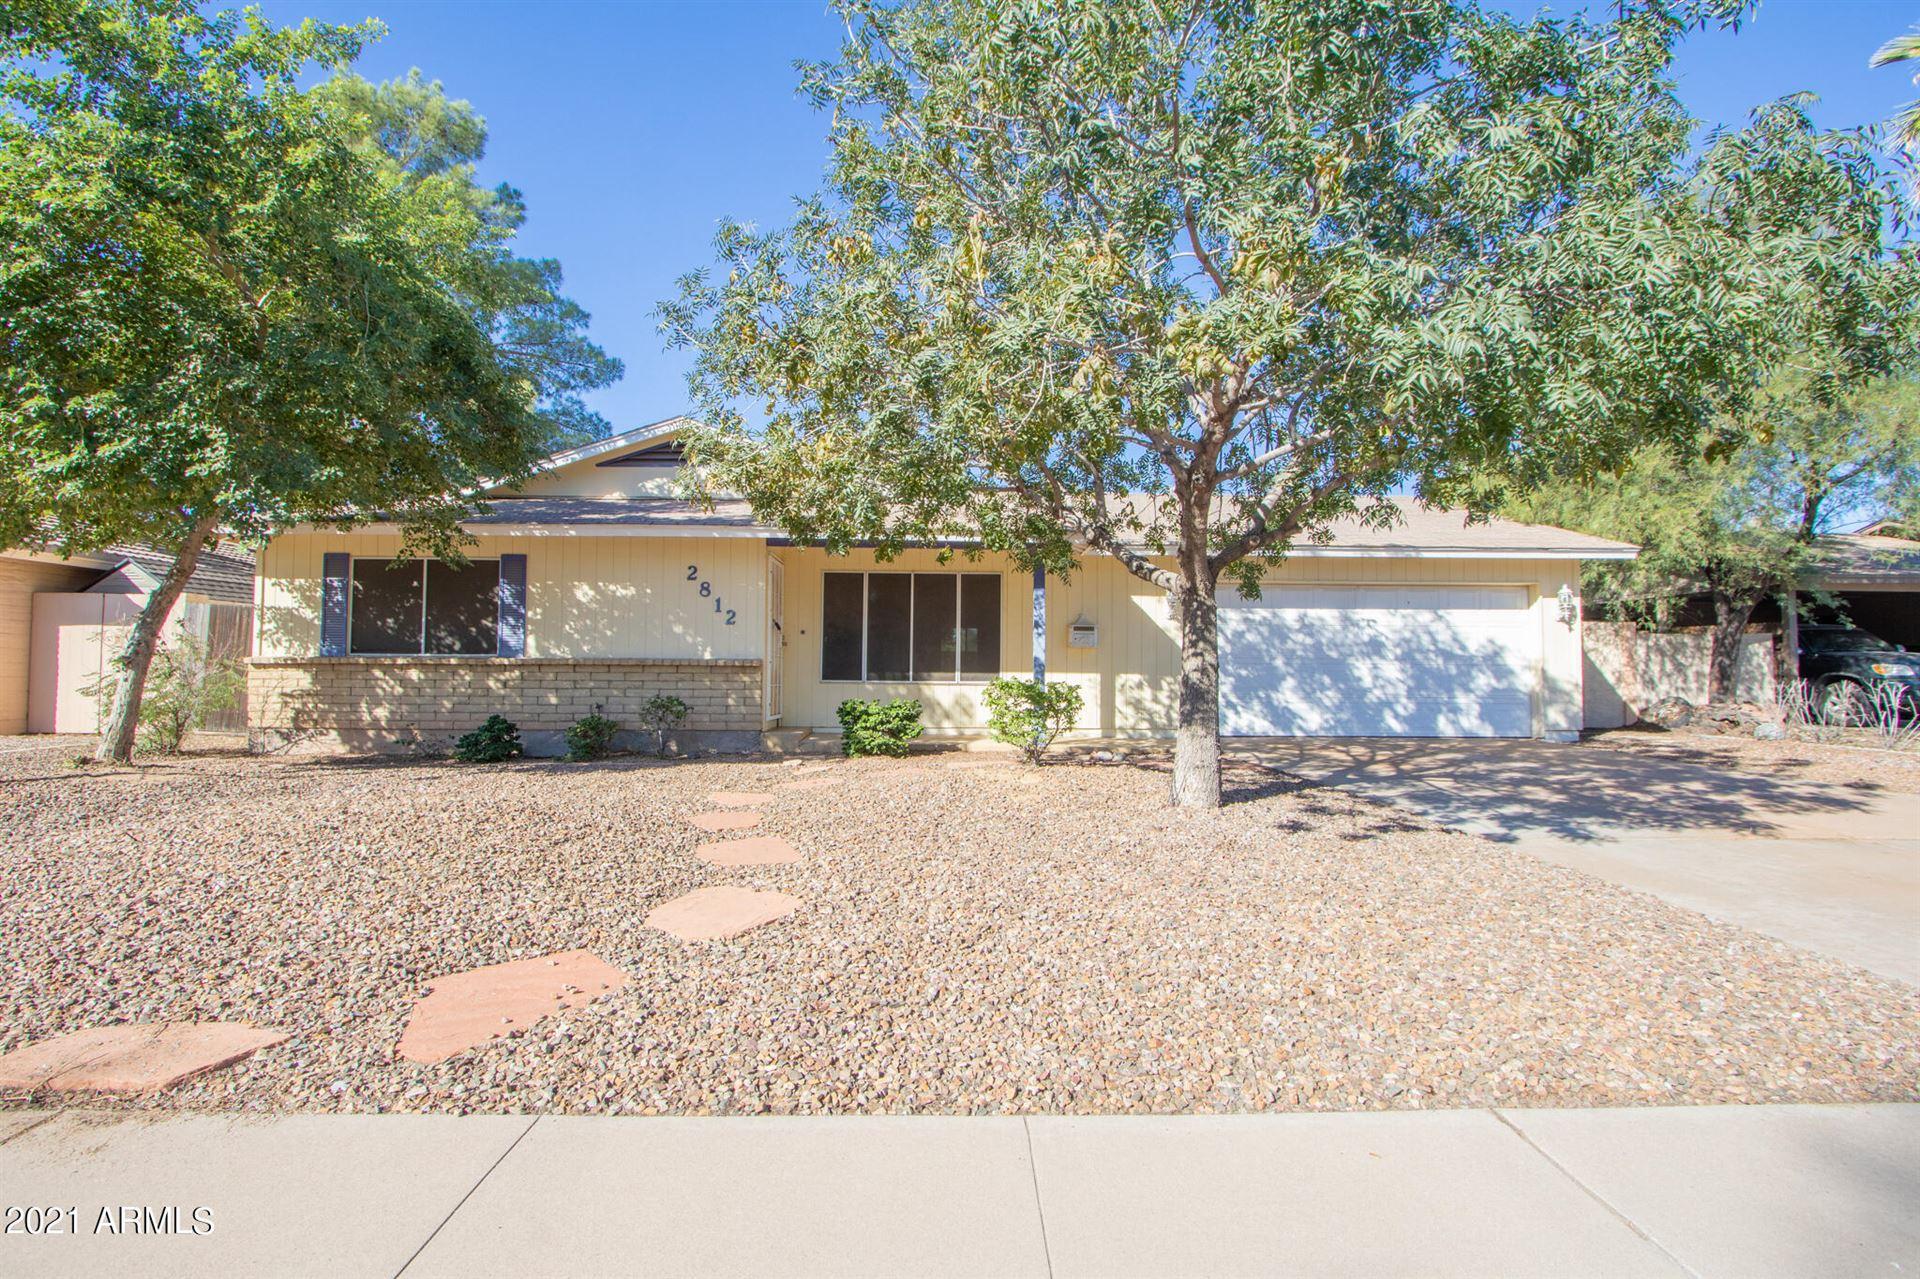 Photo of 2812 S COTTONWOOD Drive, Tempe, AZ 85282 (MLS # 6310648)